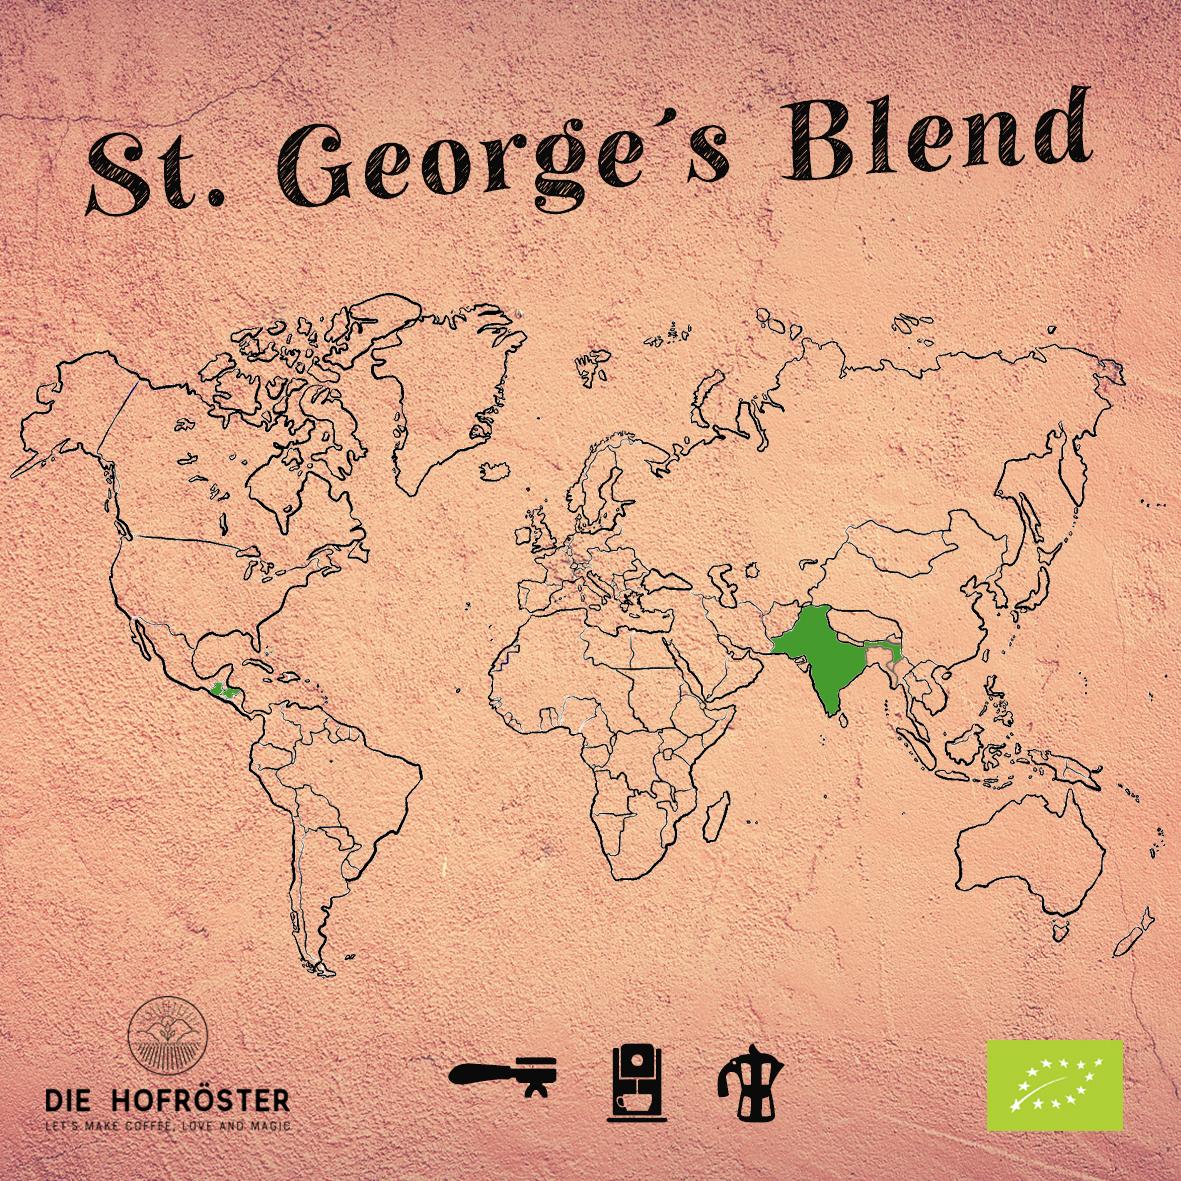 St. Georges Blend